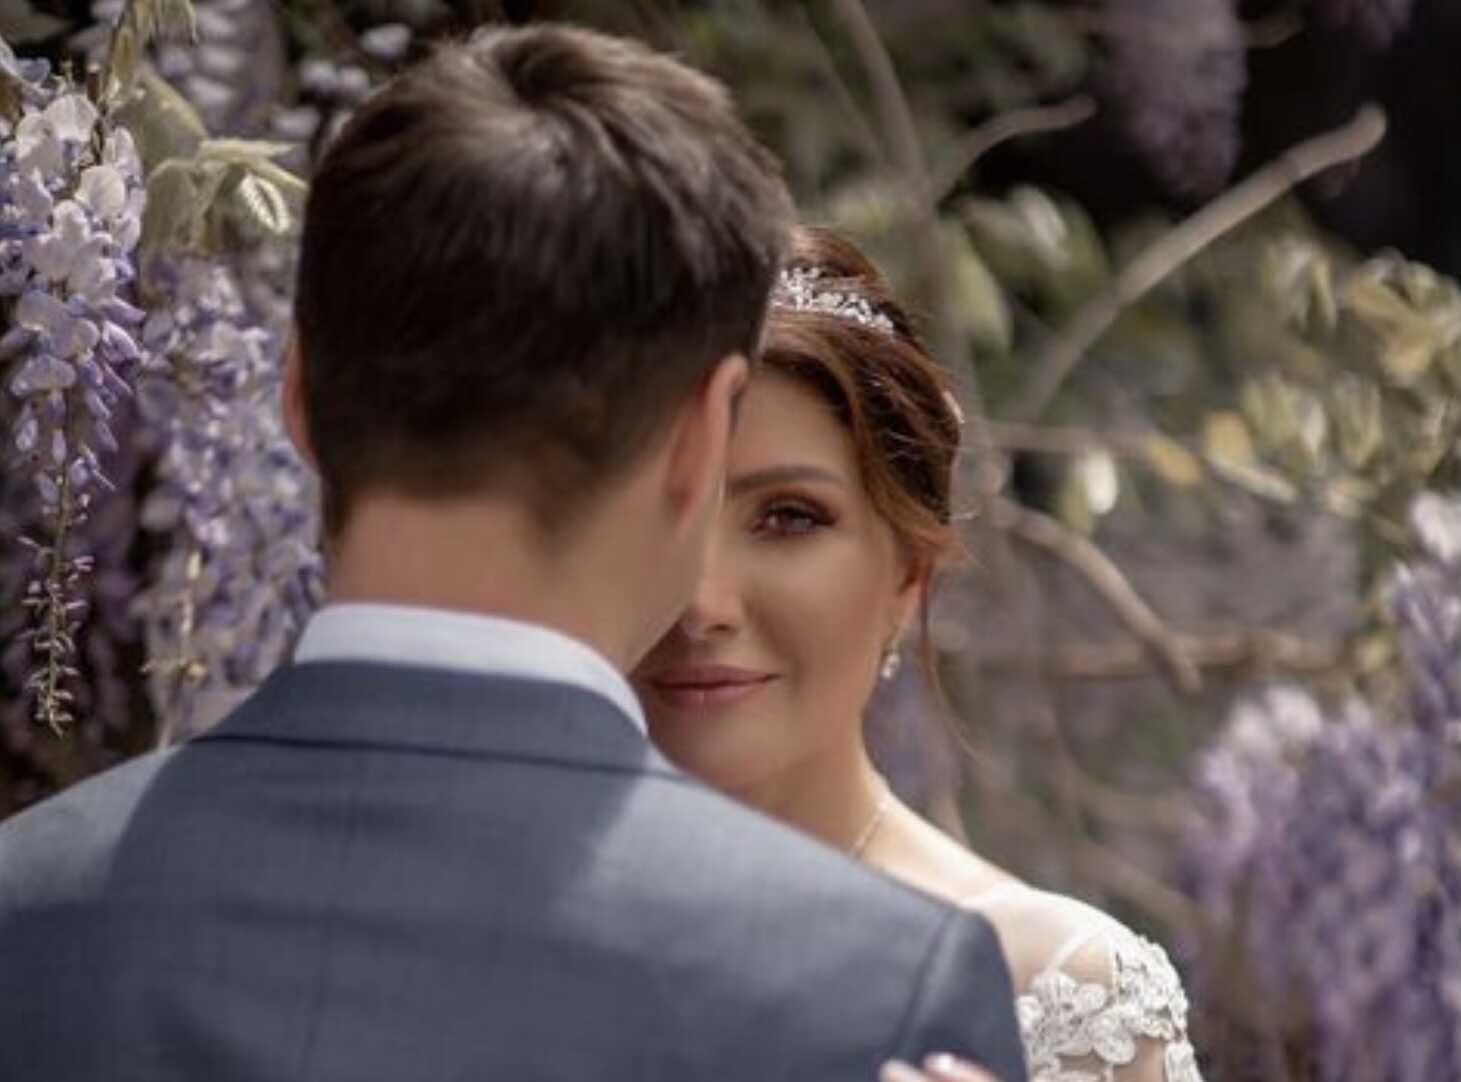 Анастасия Макеева снова вышла замуж. Фото со свадьбы